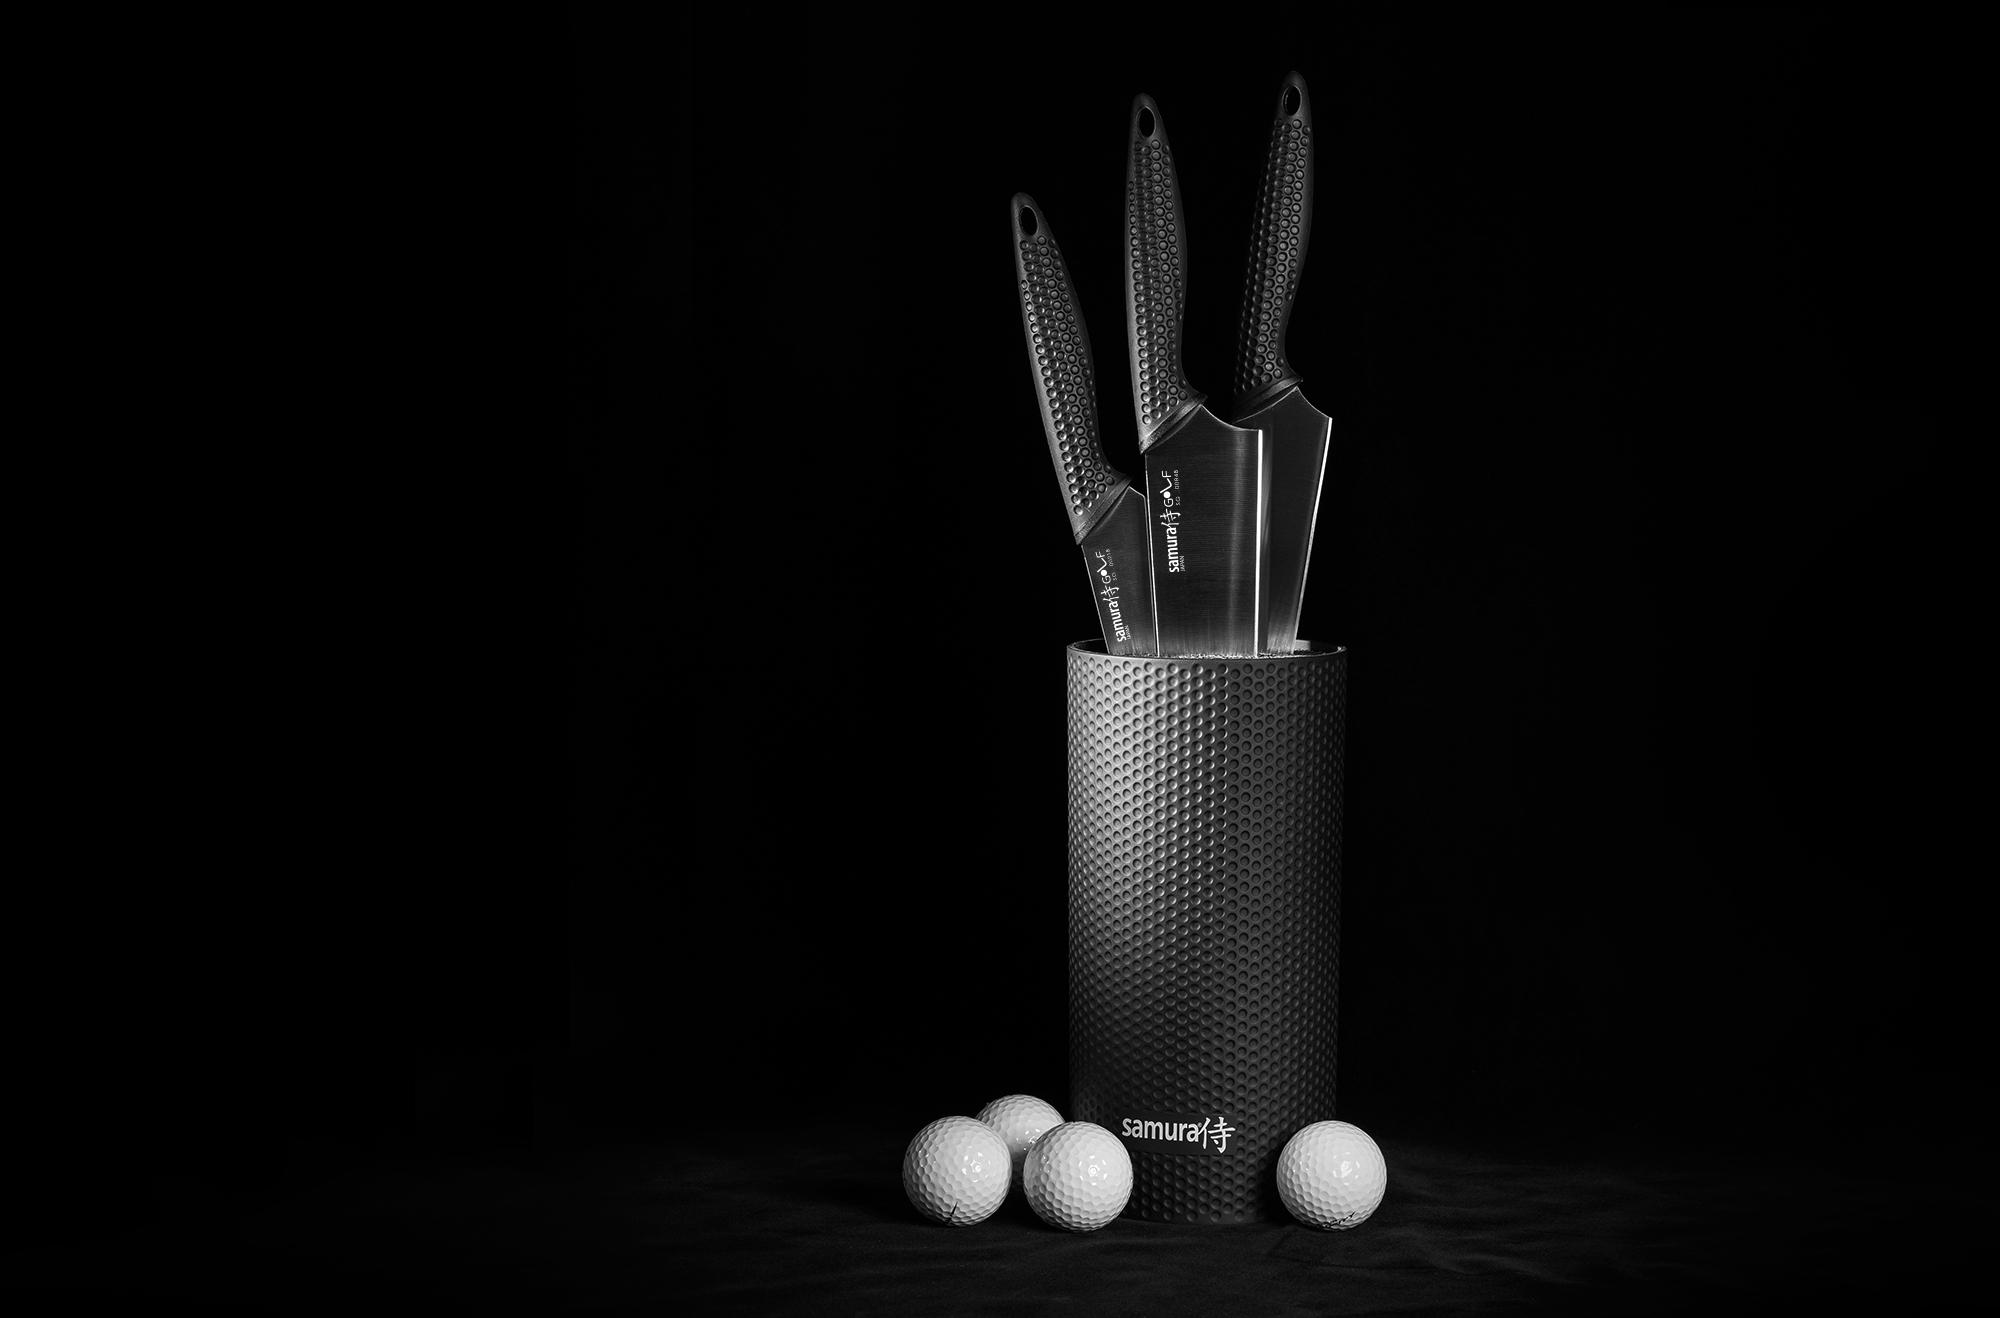 Фото 2 - Набор из 3 ножей и подставки